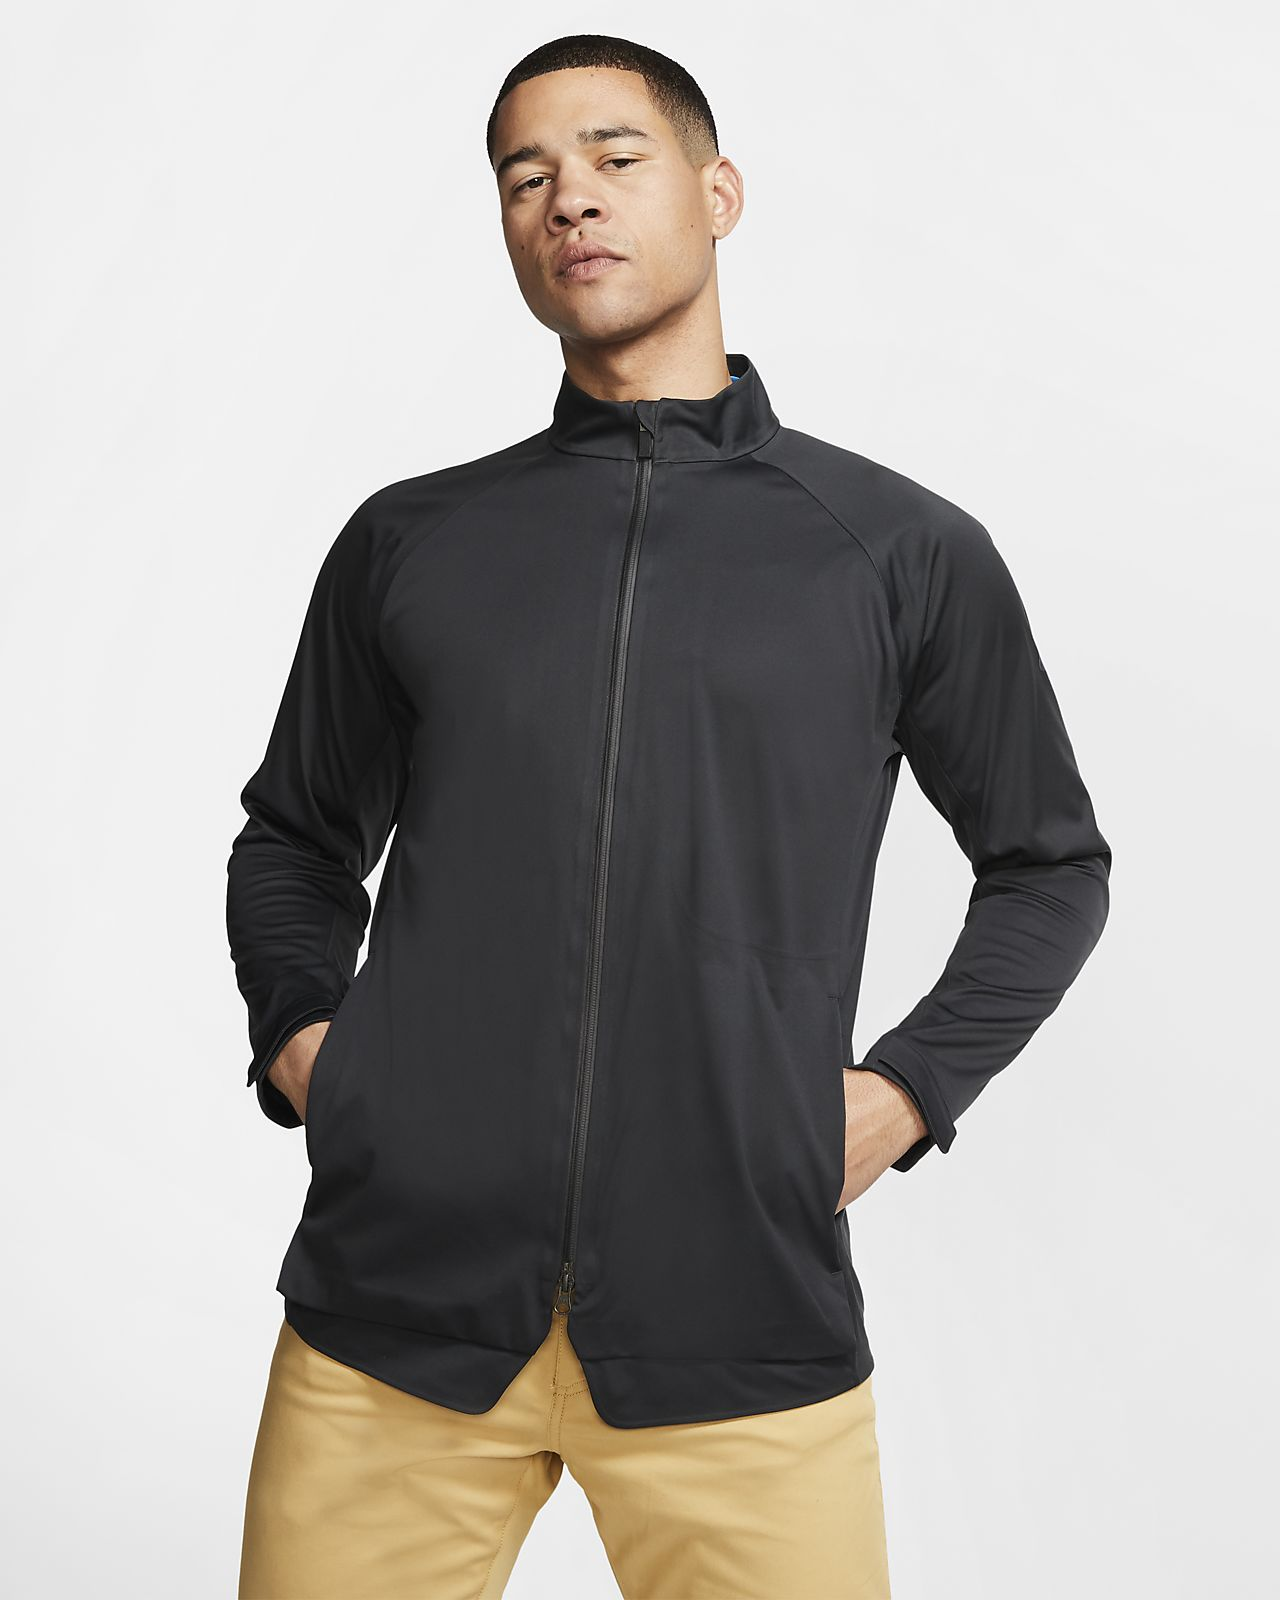 Nike AeroShield Men's Golf Jacket